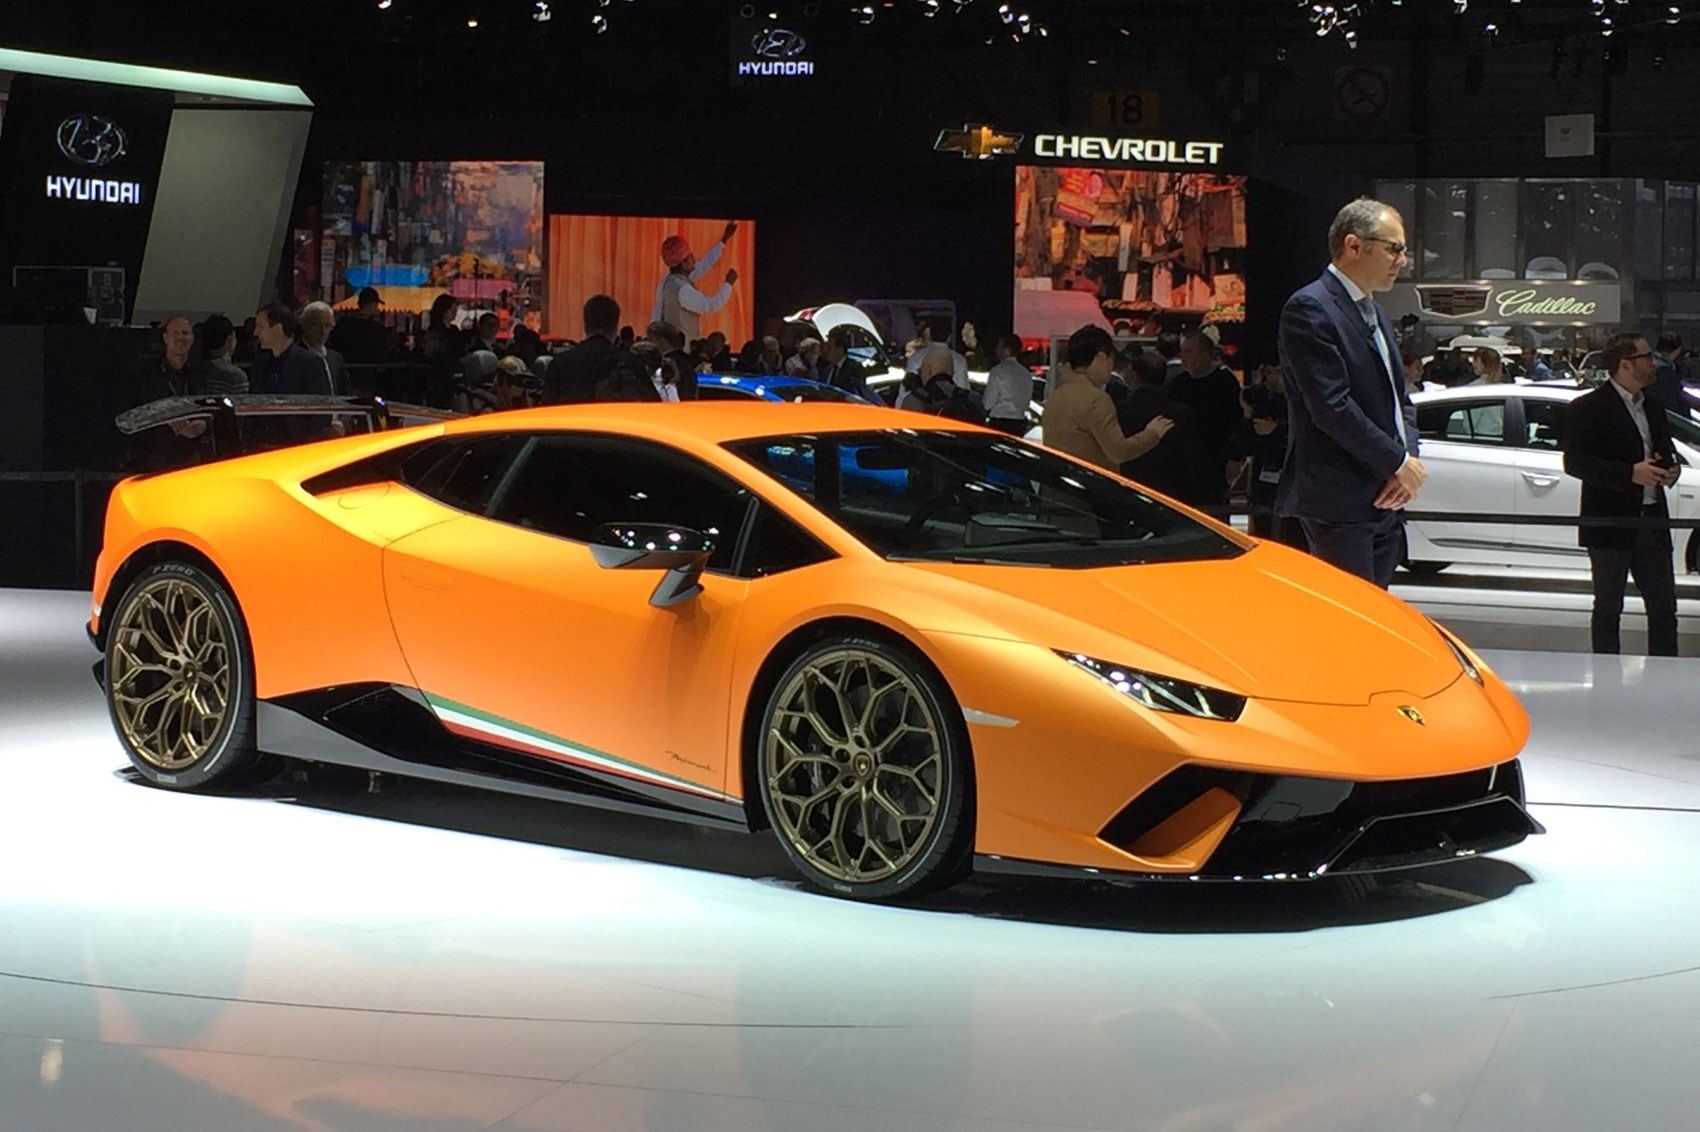 Lamborghini huracan performante races into geneva by car magazine - Geneva car show ...